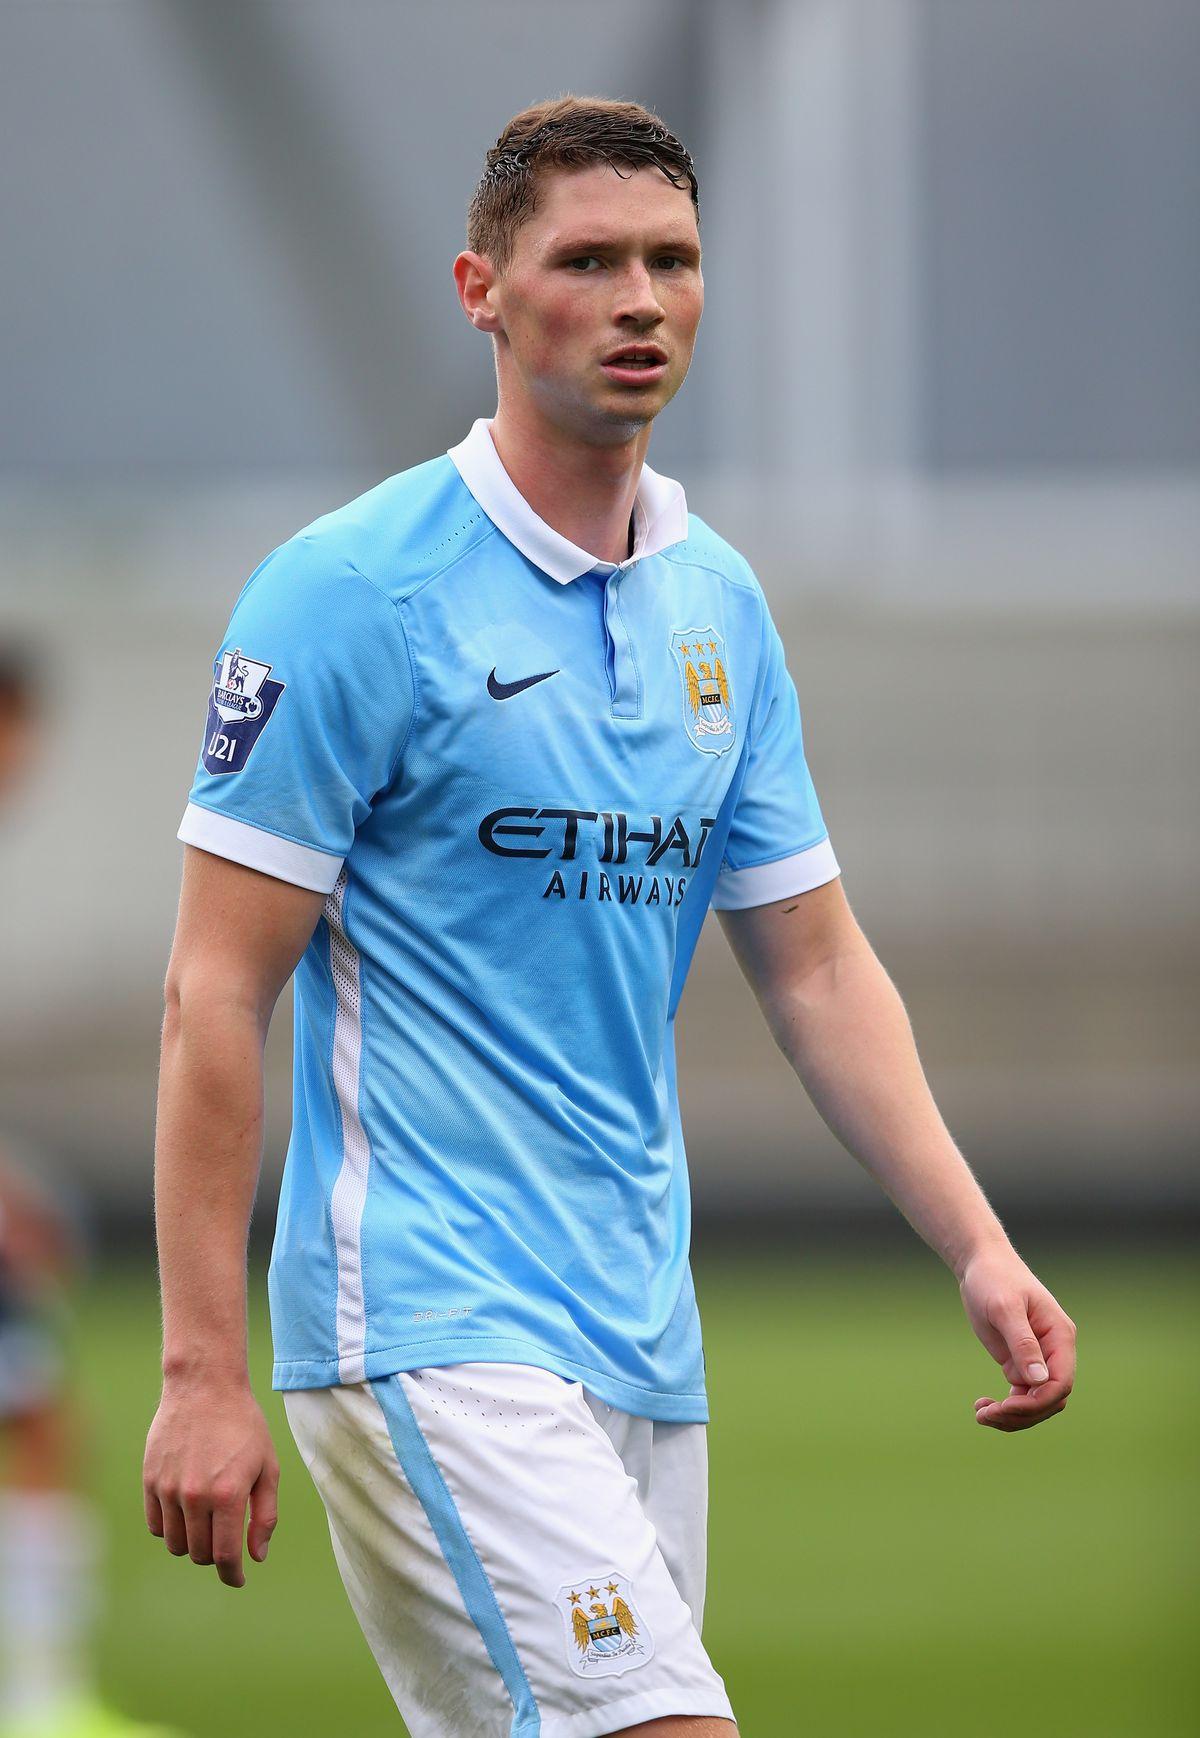 Manchester City U21 v Tottenham Hotspur U21: Barclays U21 Premier League